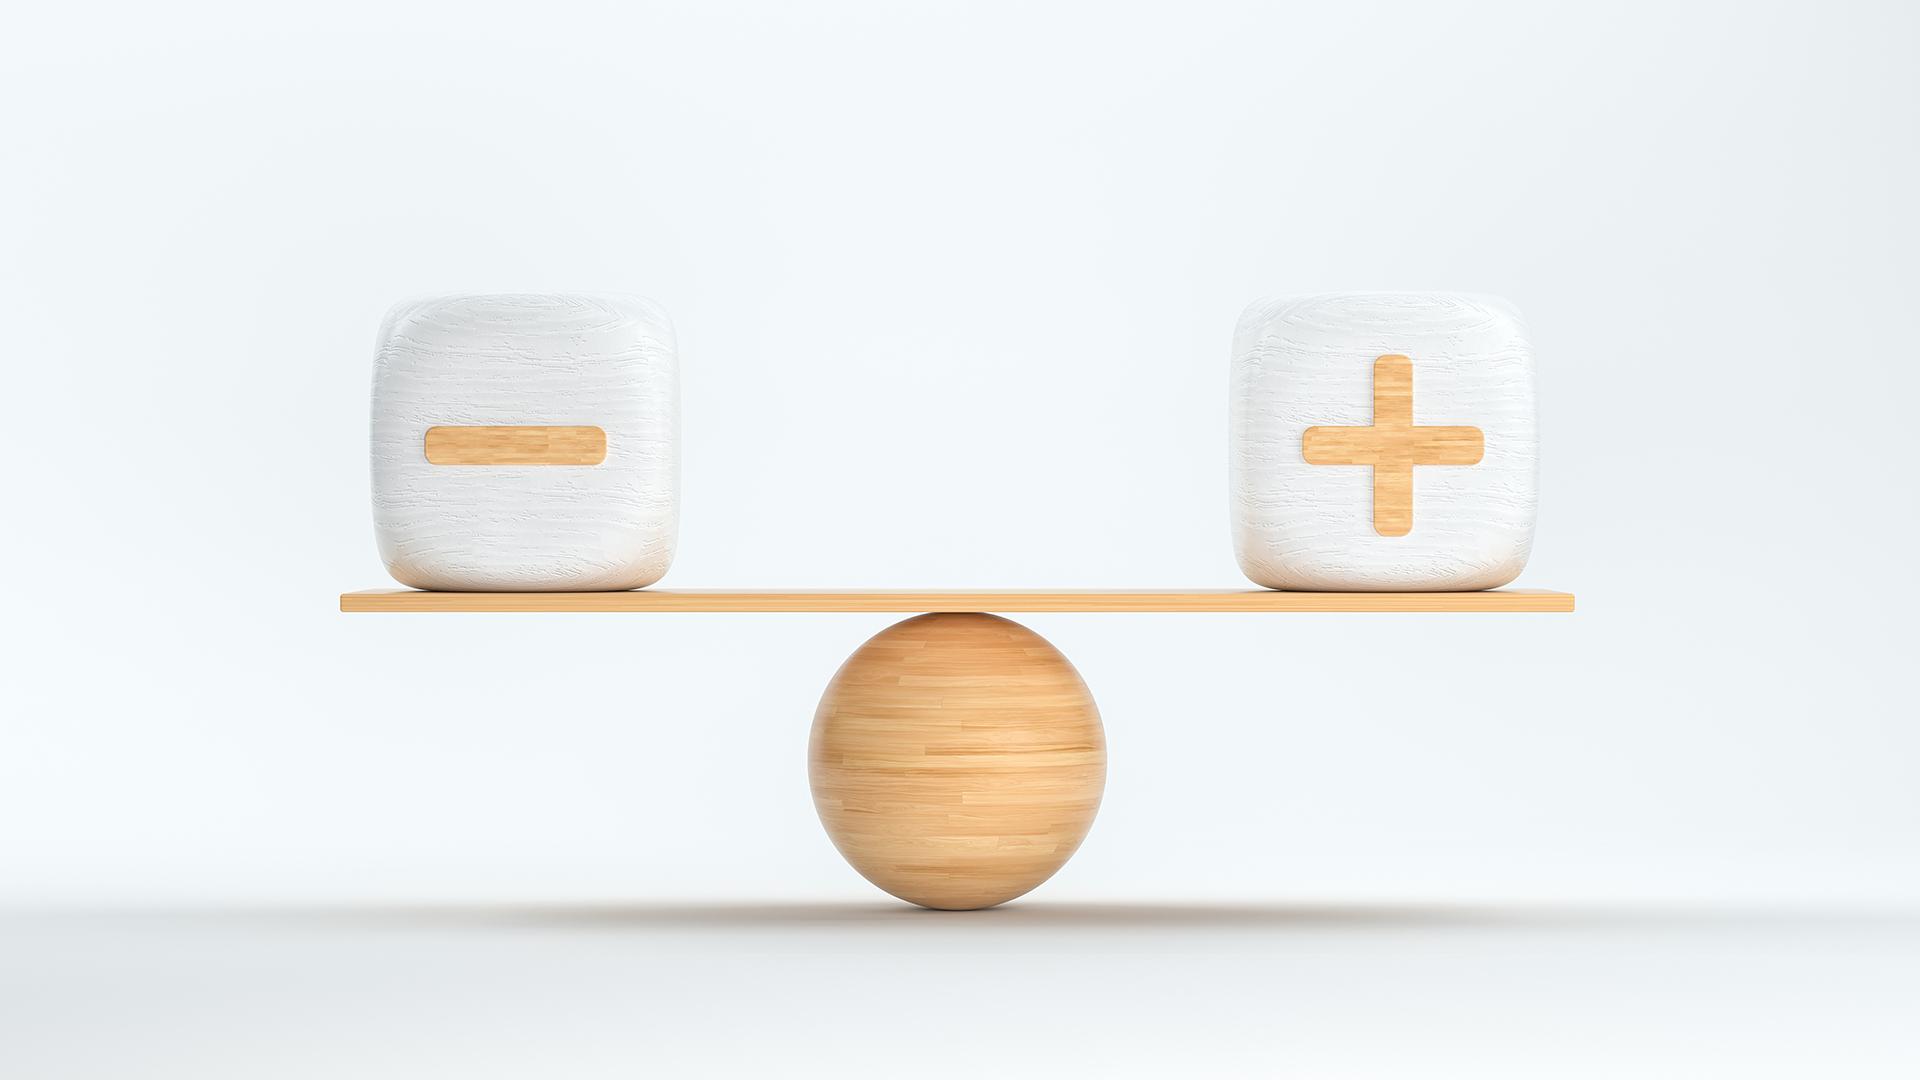 WellbeingHub studylifebalance